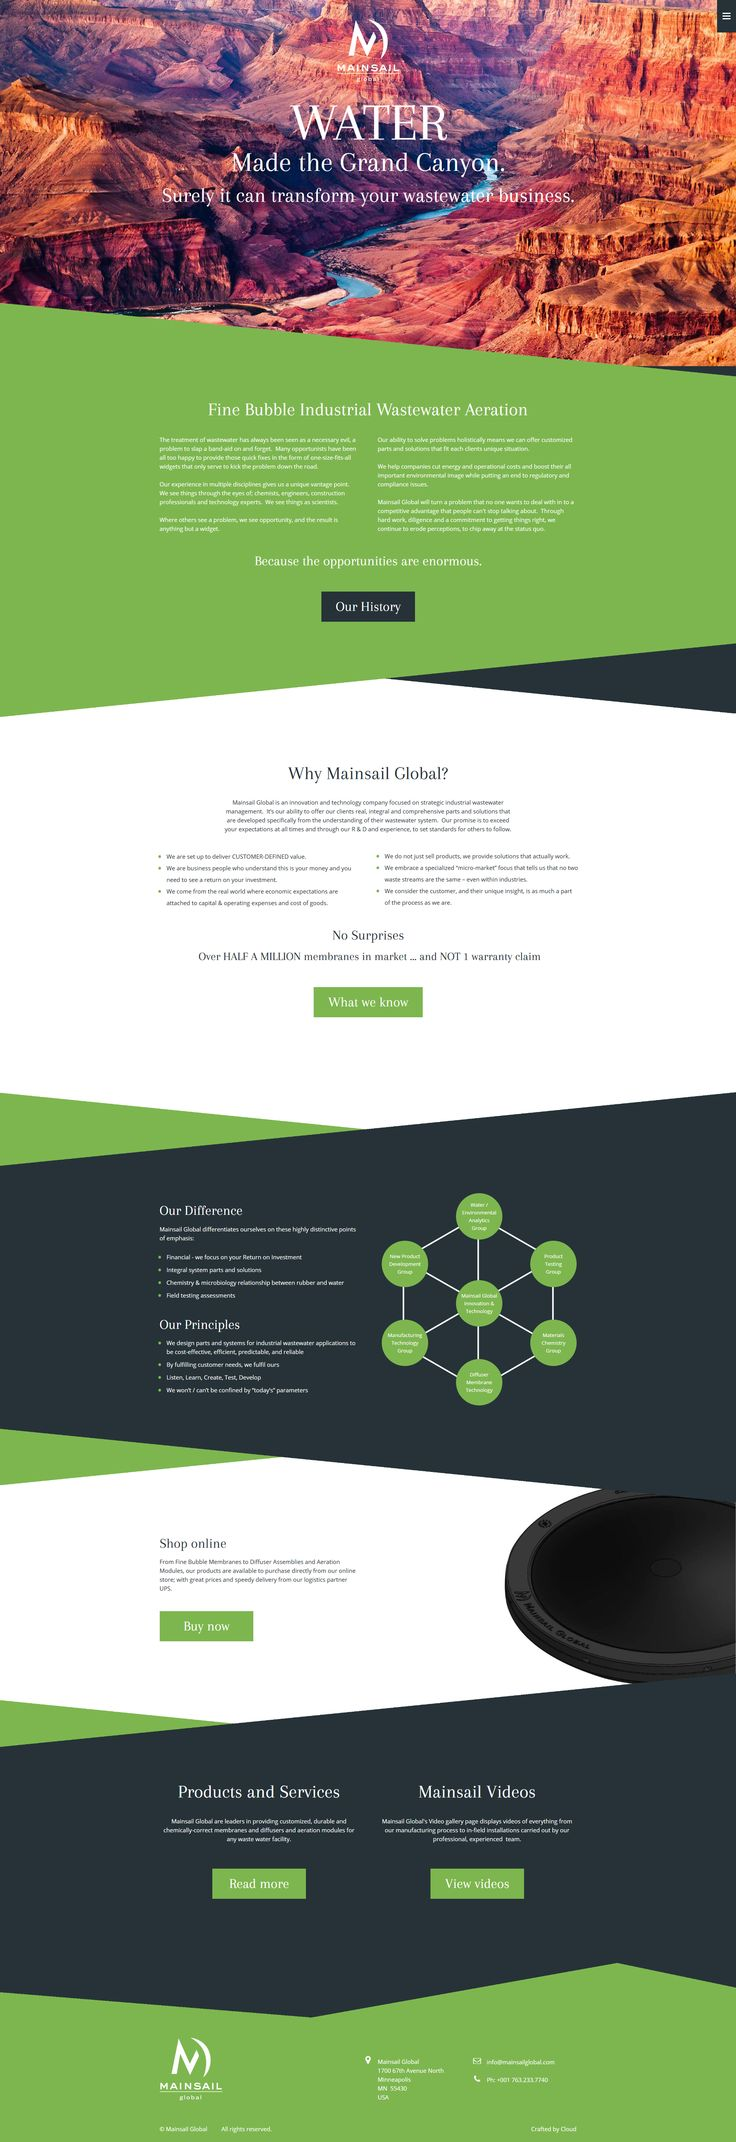 Website created for Mainsail Global in Minneapolis, Minnesota. #website #inspiration #webdesign #minneapolis #minnesota #usa